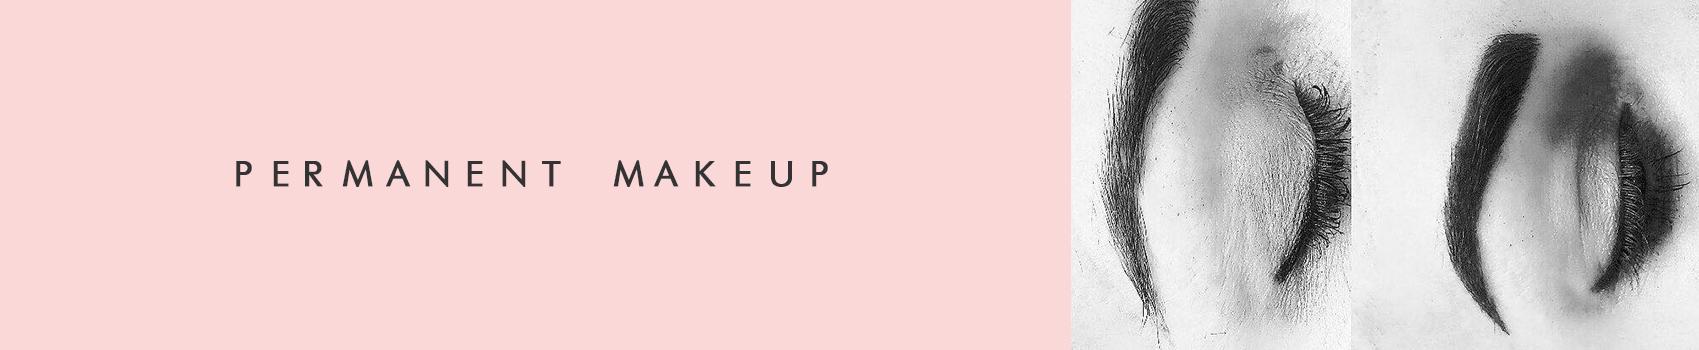 banner-permanent-makeup.jpg